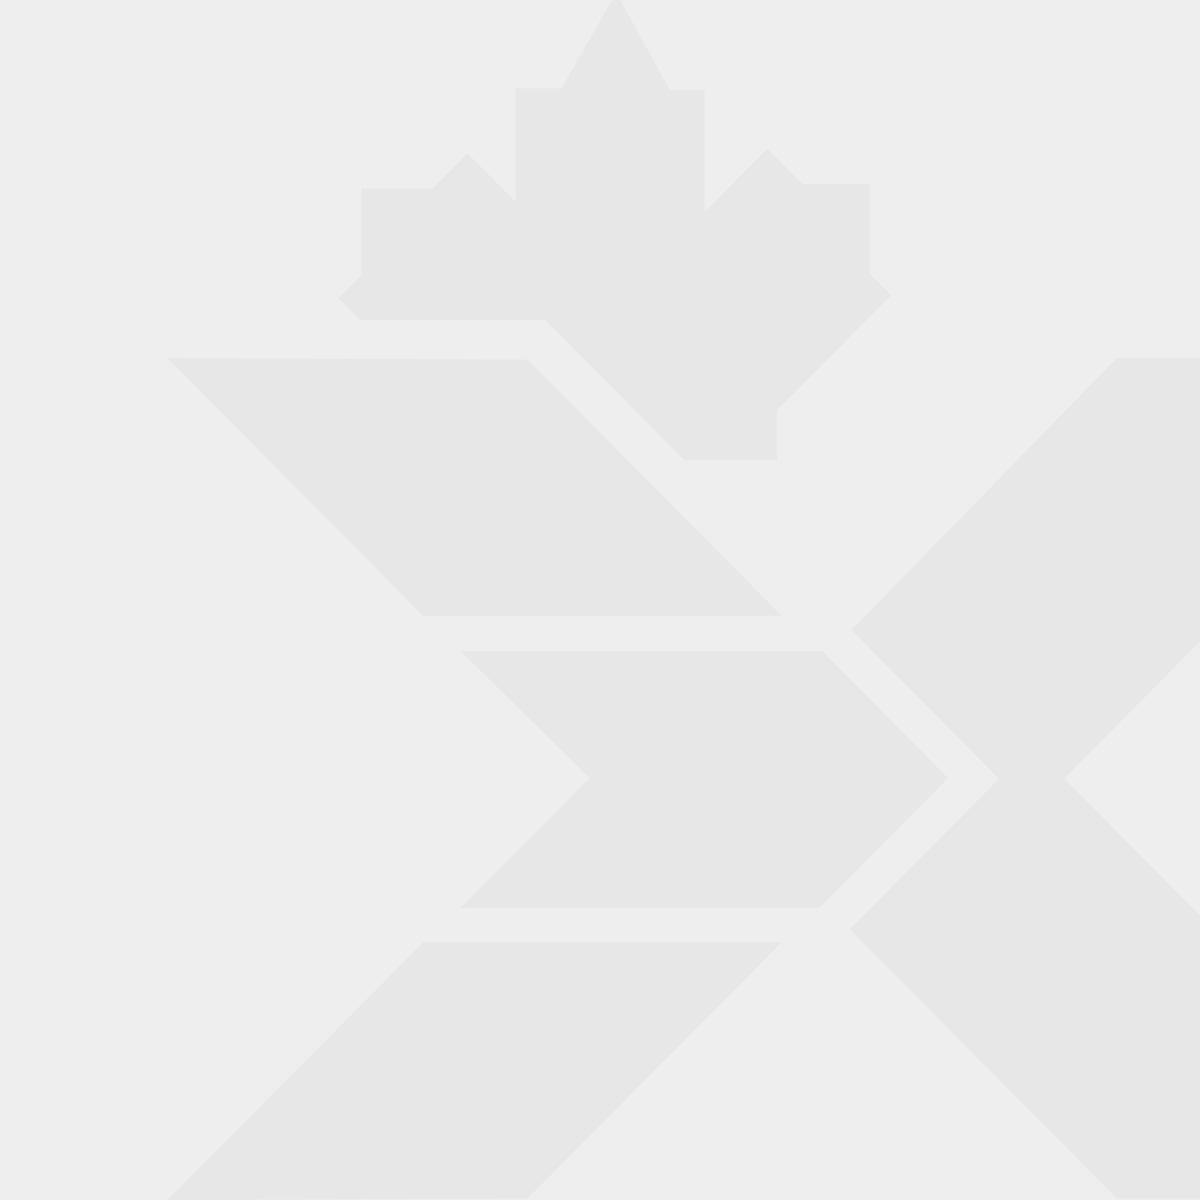 Spiral Ruled Notebook - HMCS Calgary